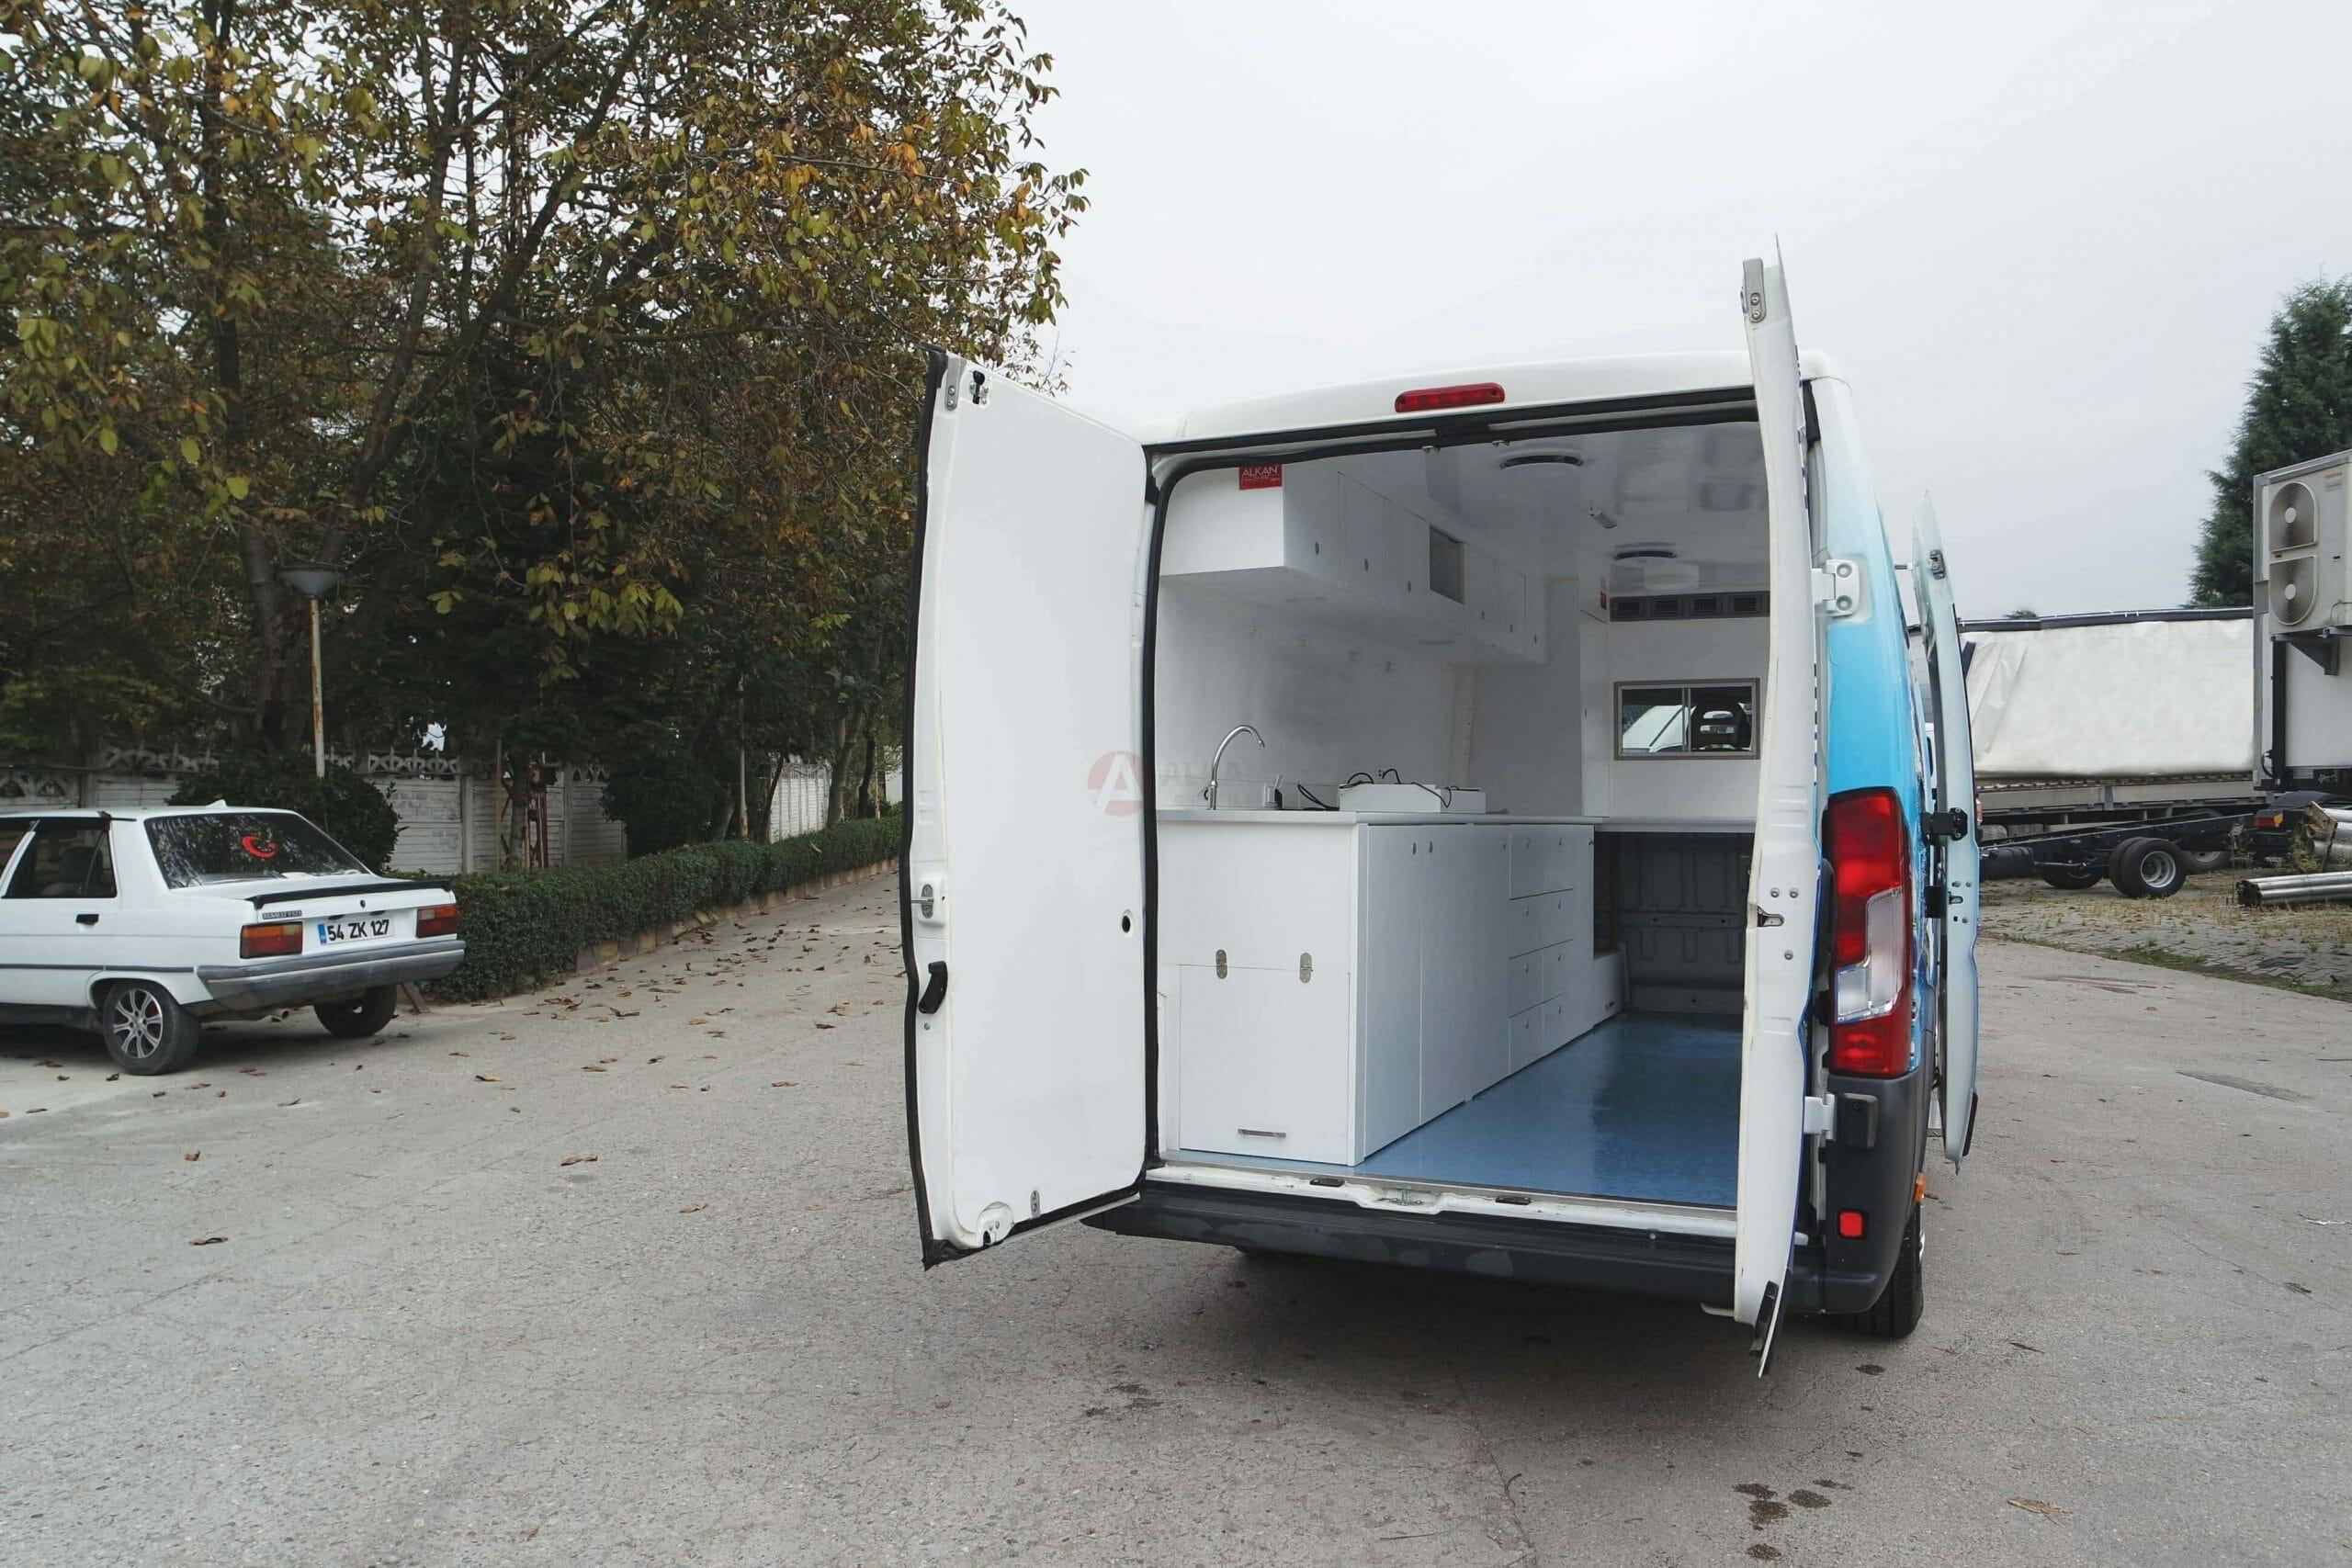 mobile-laboratory-analysis-vehicle-2-scaled.jpg